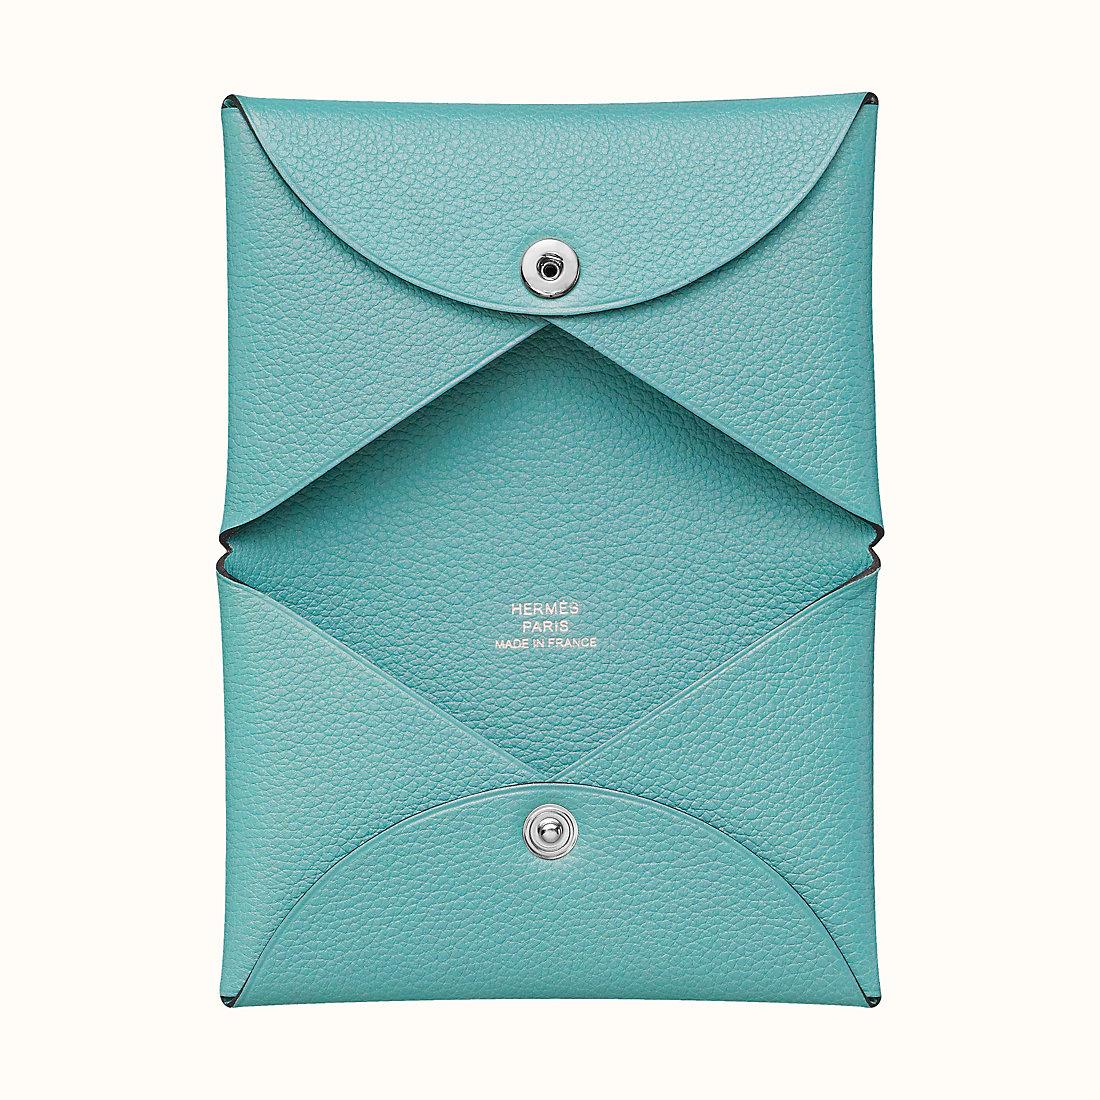 Hermes Evercolor Calvi verso card holder 3P Blue Atoll 马卡龙蓝